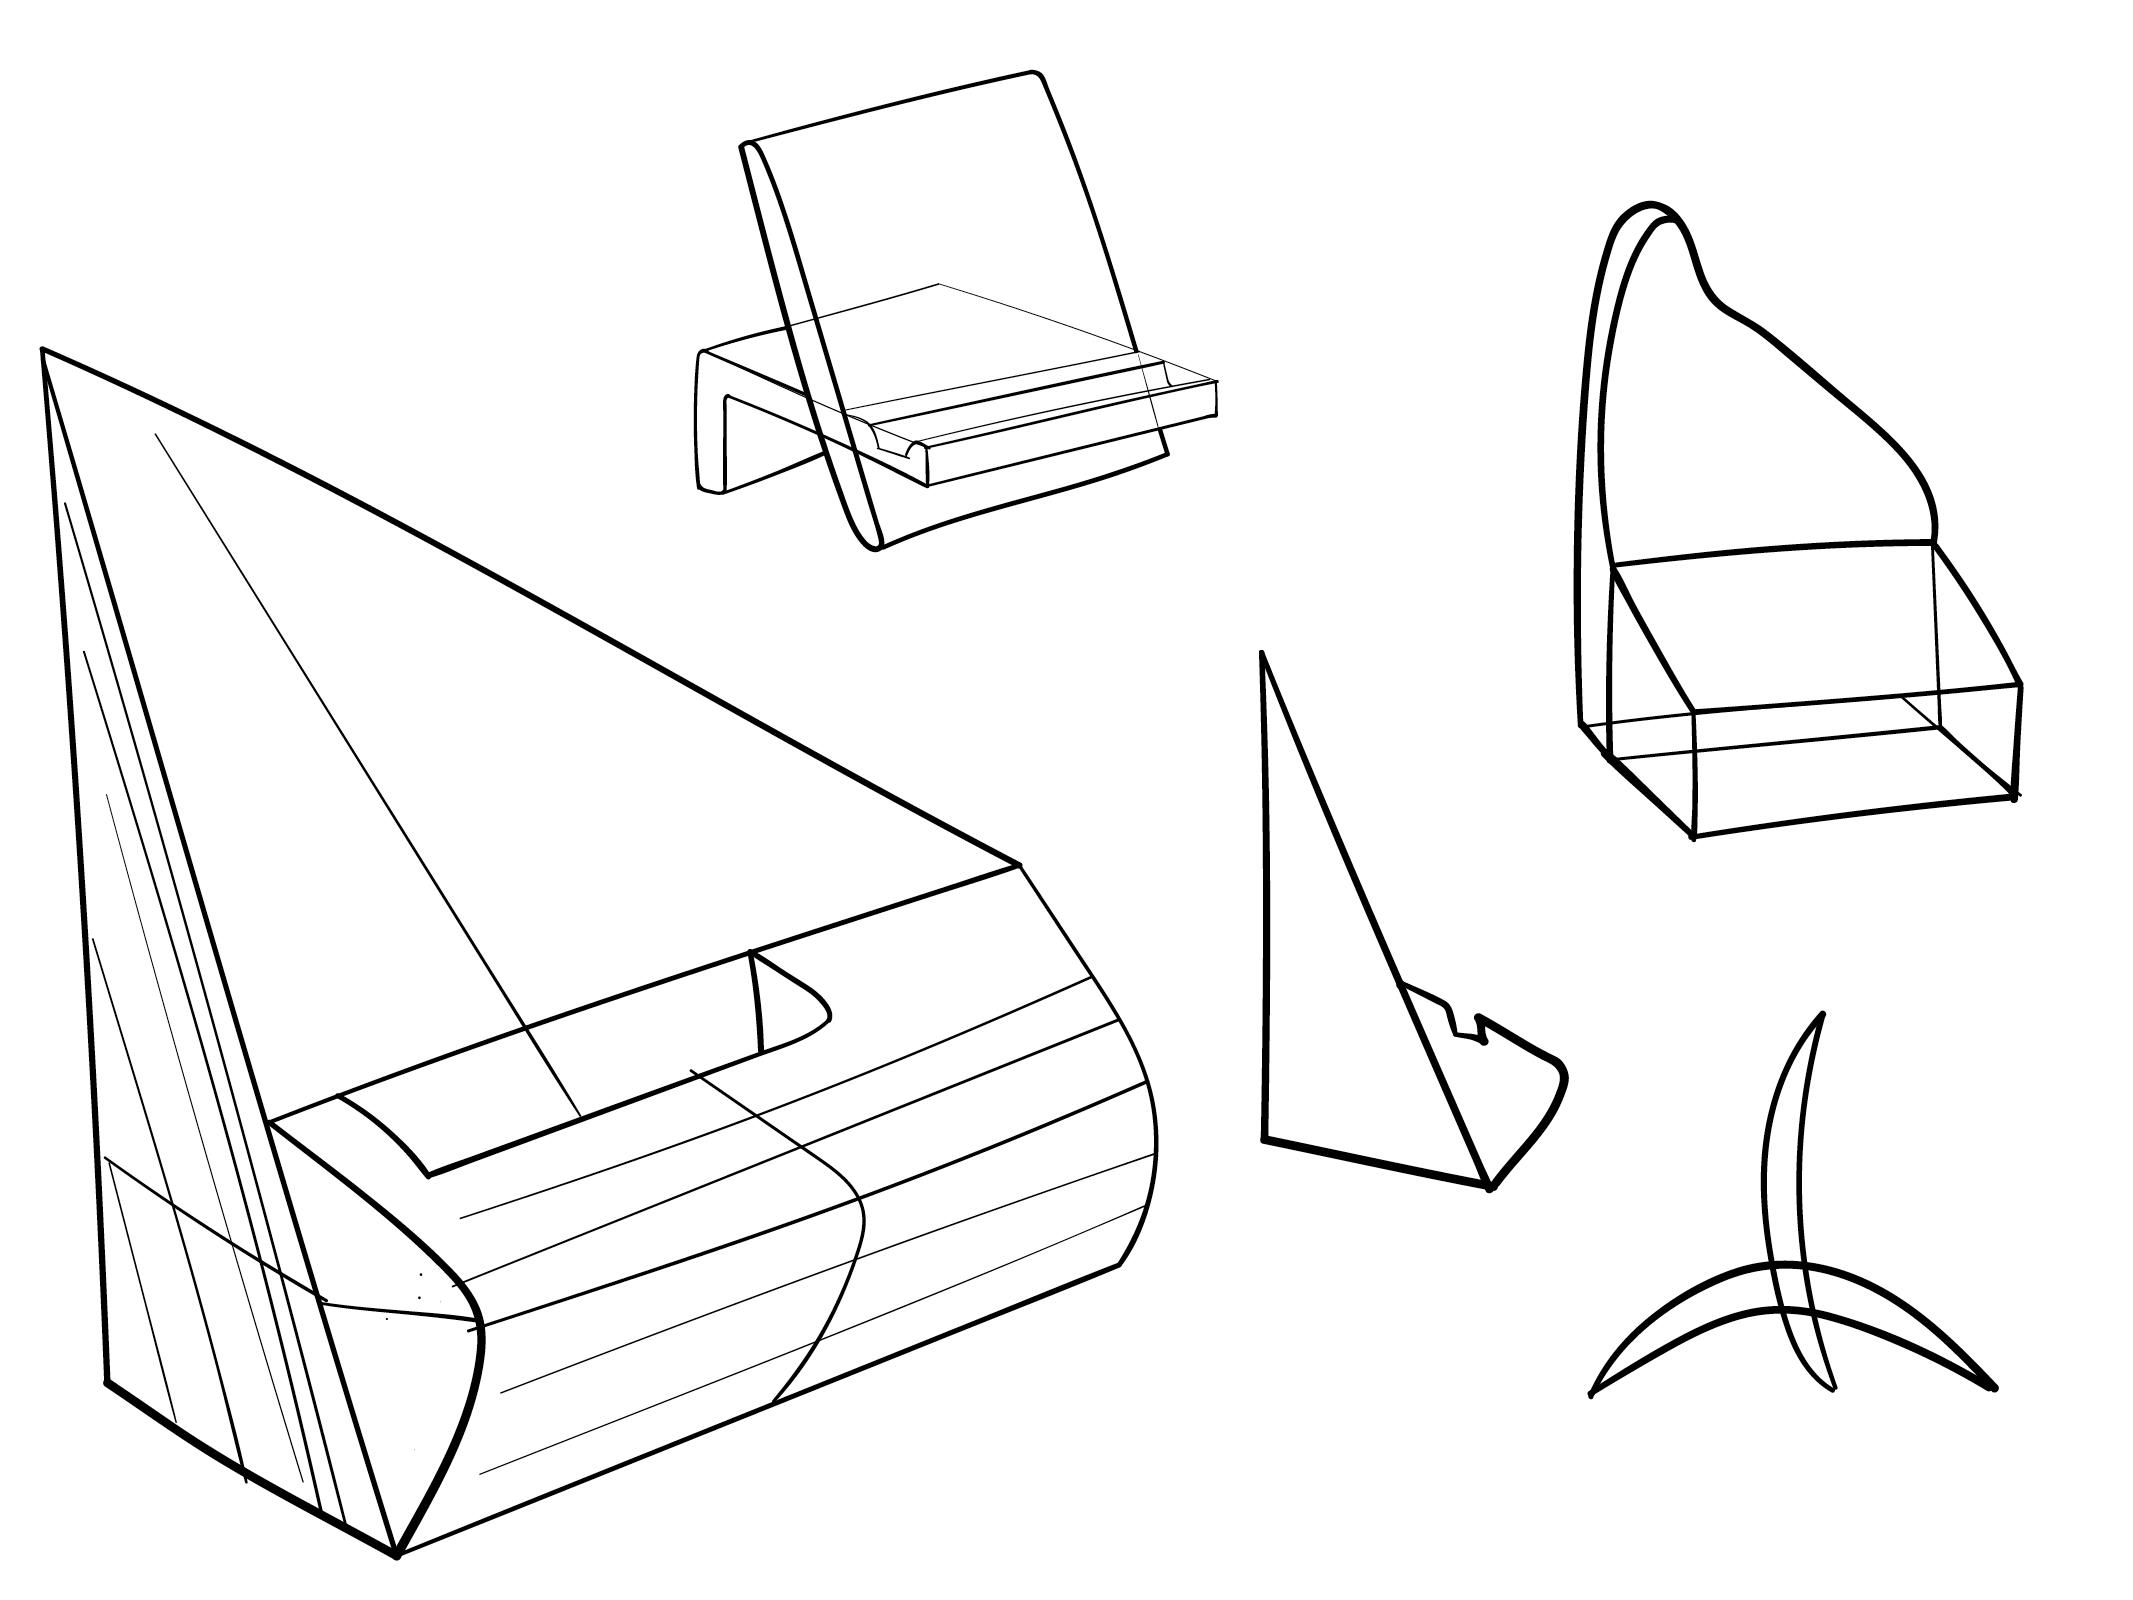 2014_studio_surfacing_Ideation.jpg